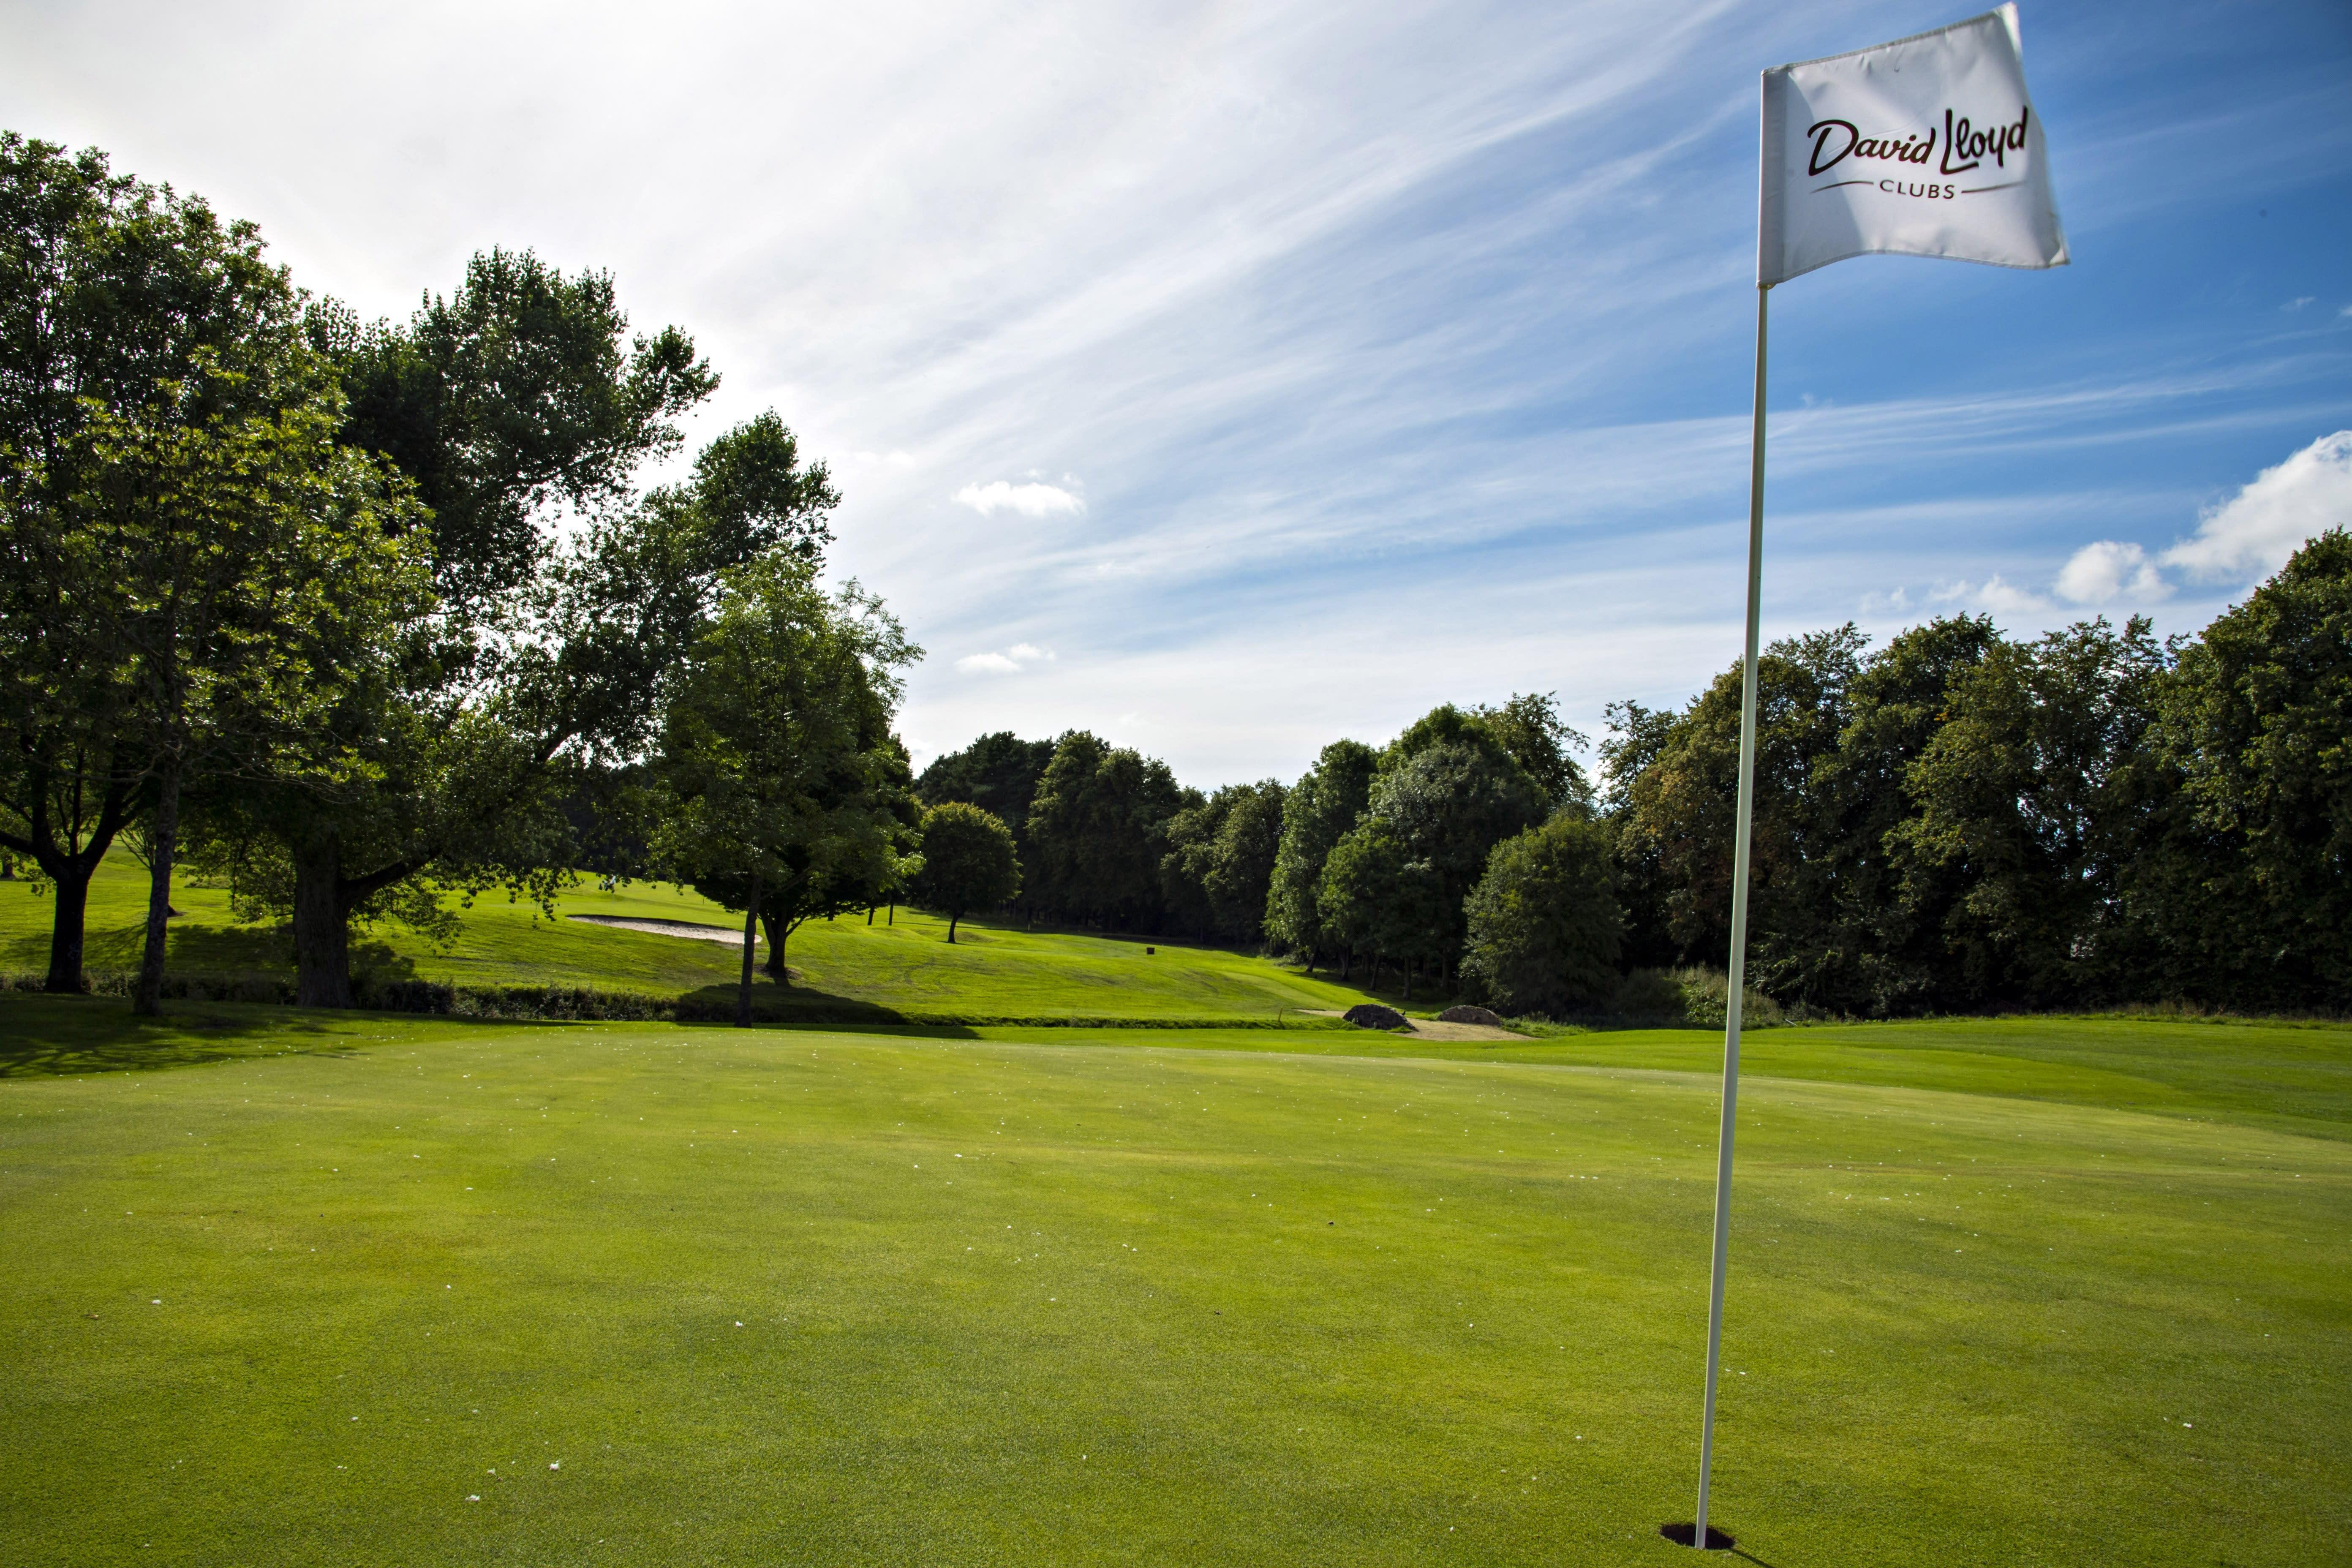 Golf at Glasgow Rouken Glen